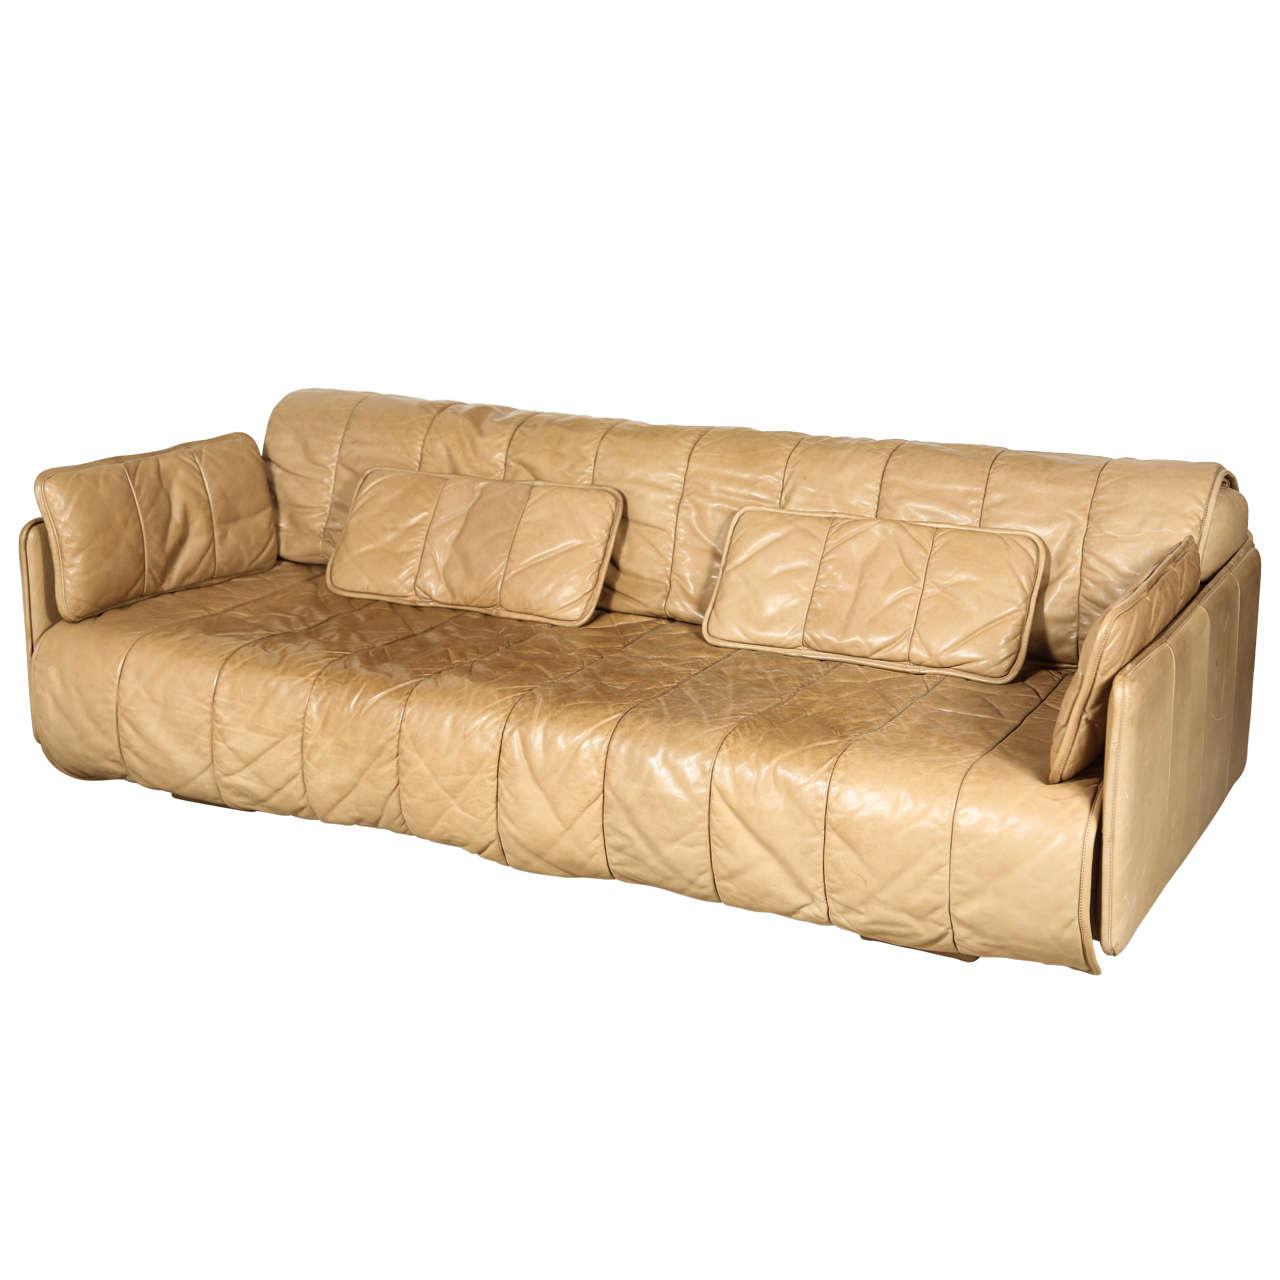 de sede sleeper sofa tropical bed x jpg